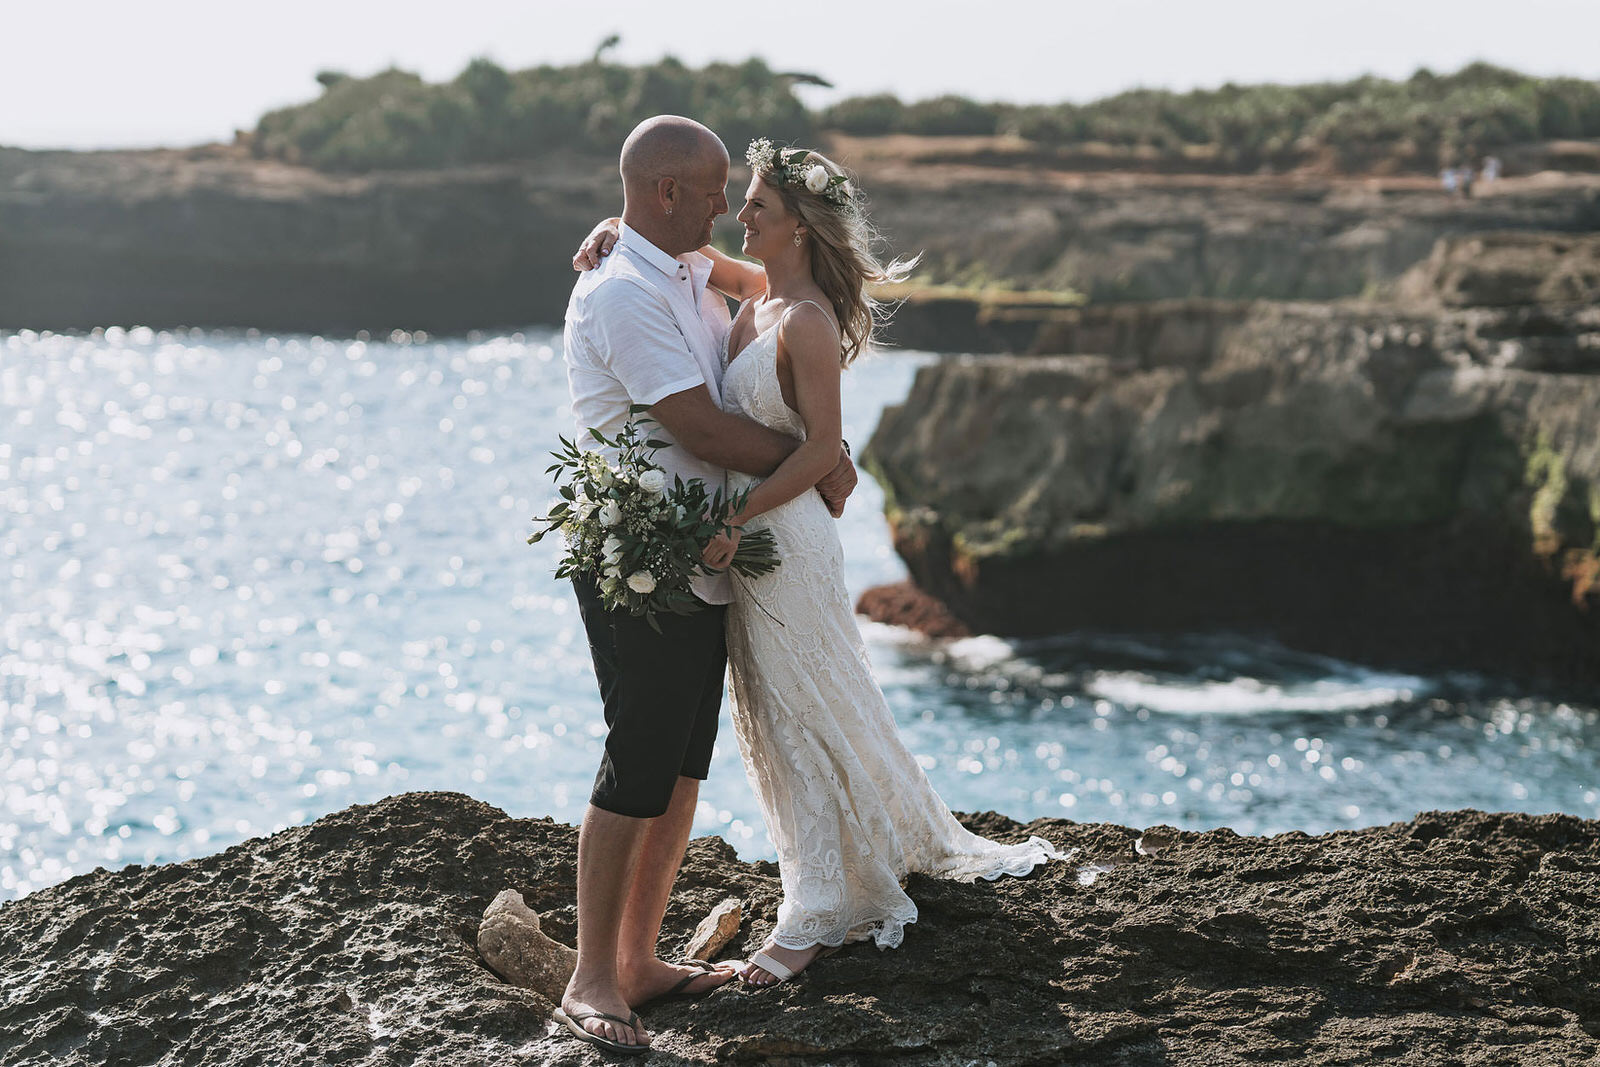 newfound-hai-tide-nusa-lembongan-bali-wedding-photographers-094